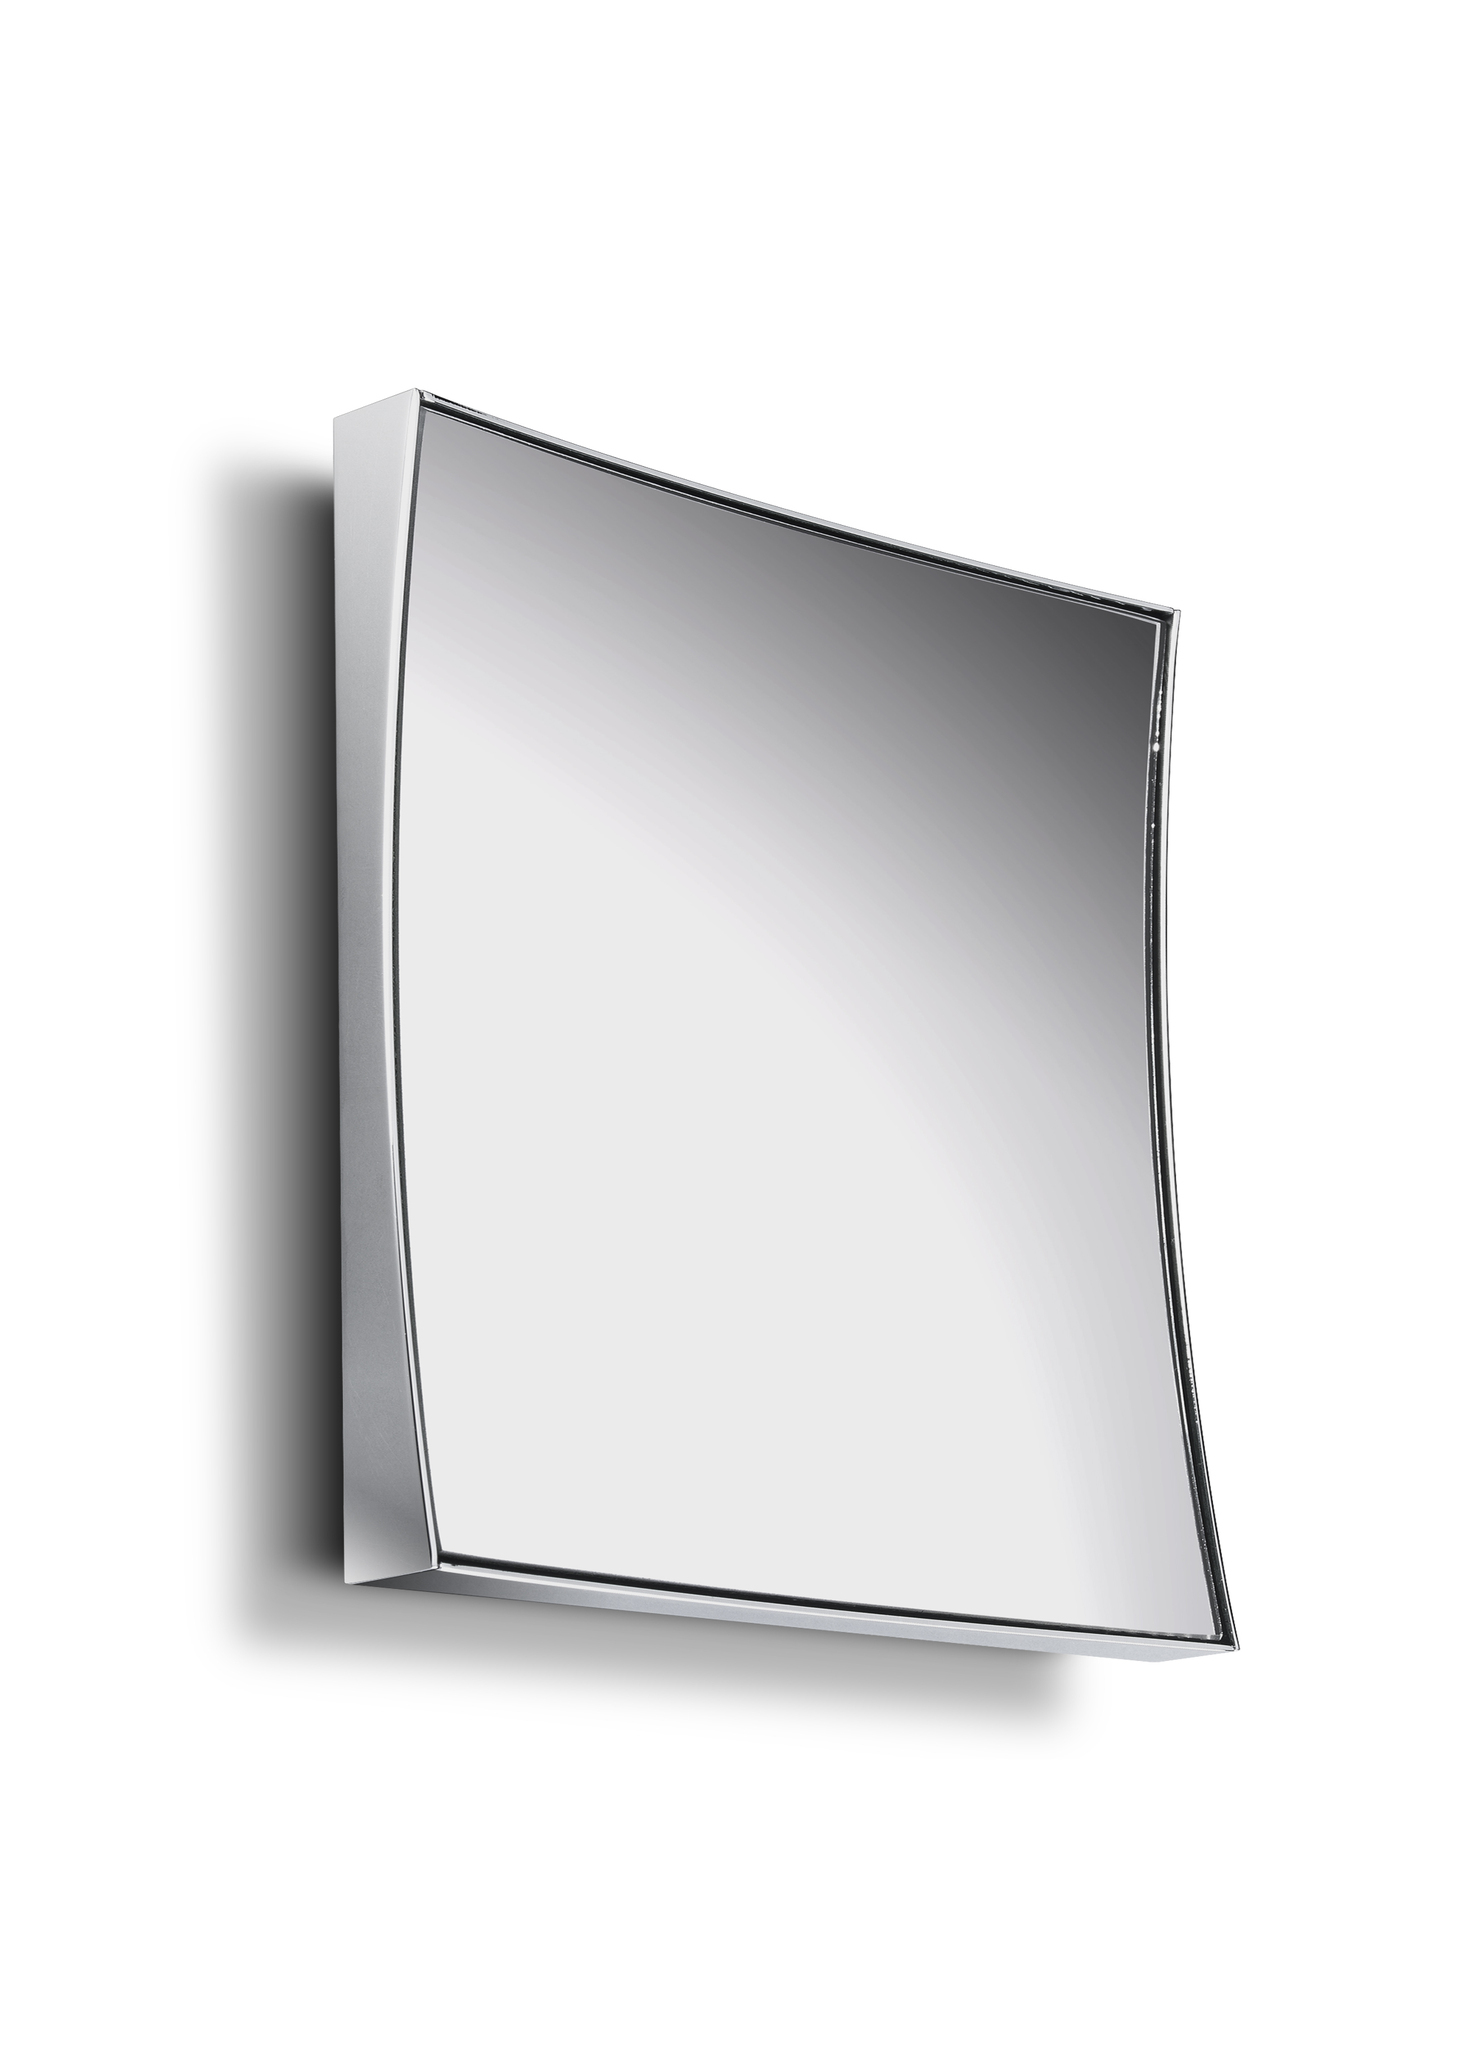 Зеркала Зеркало косметическое на присосках Windisch 99305CR 3X elitnoe-zerkalo-kosmeticheskoe-na-prisoskah-99305-ot-windisch-ispaniya.jpg